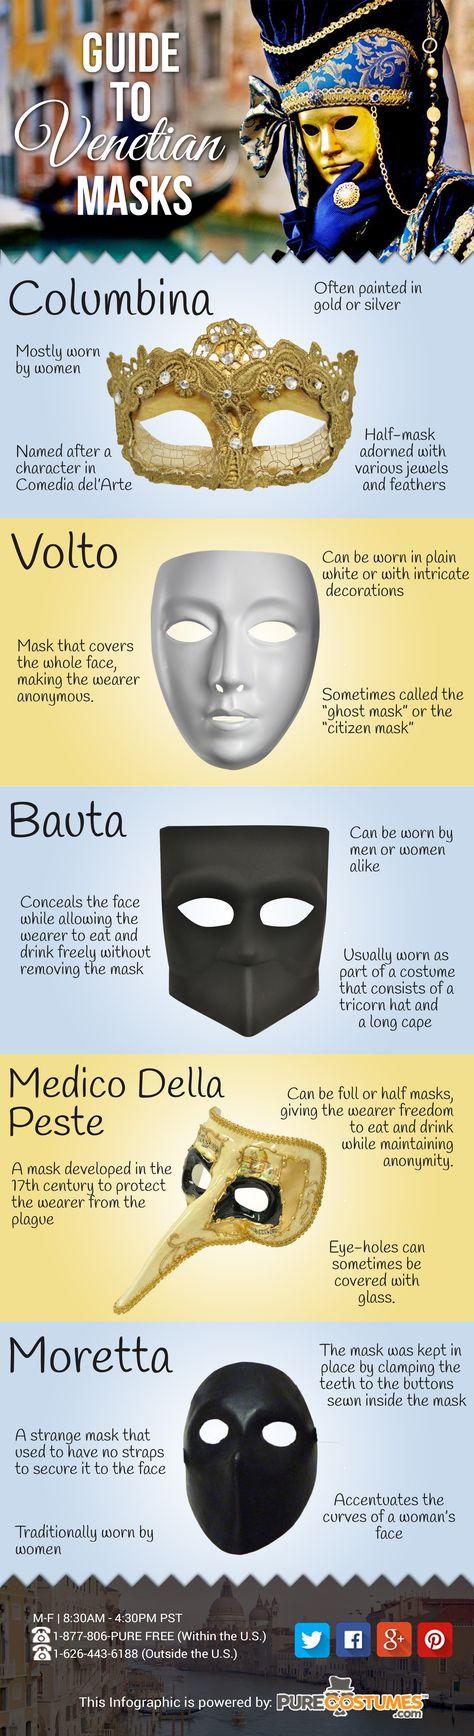 Plain White Masks To Decorate Prepossessing 104 Best Masks Images On Pinterest  Masks Costumes And Headdress 2018